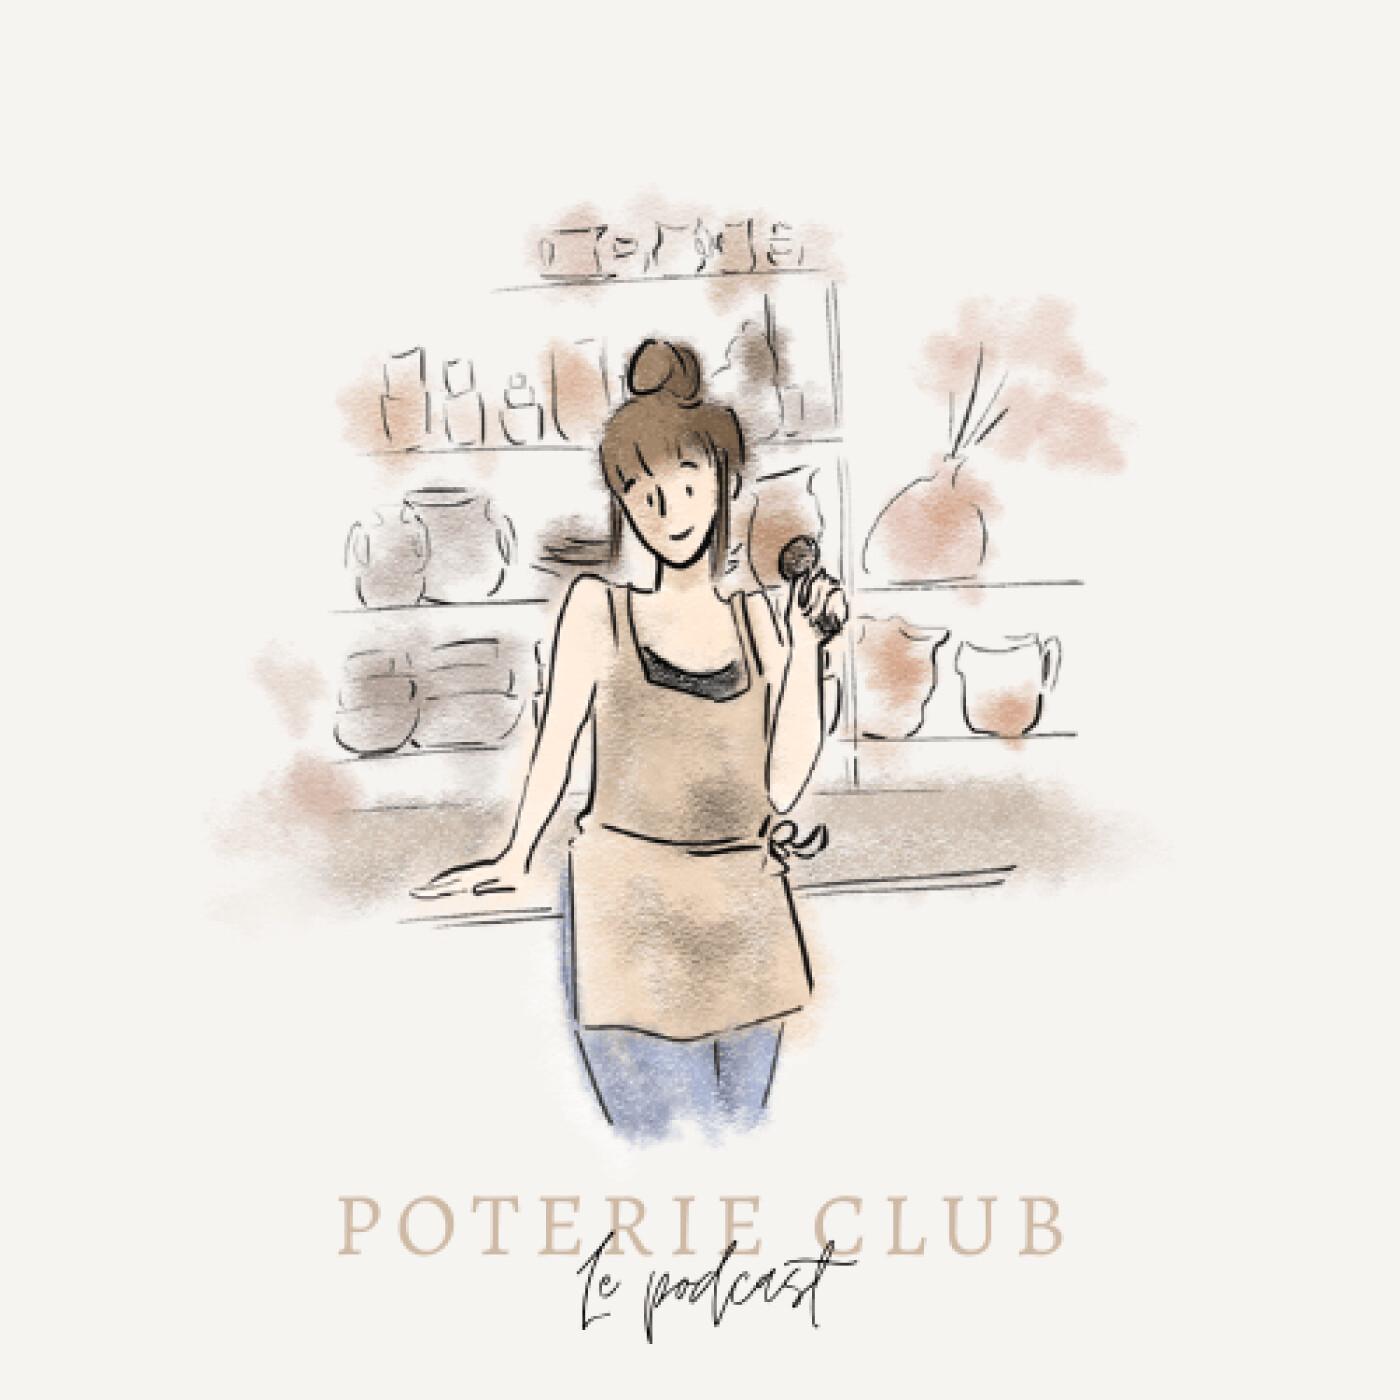 Poterie Club